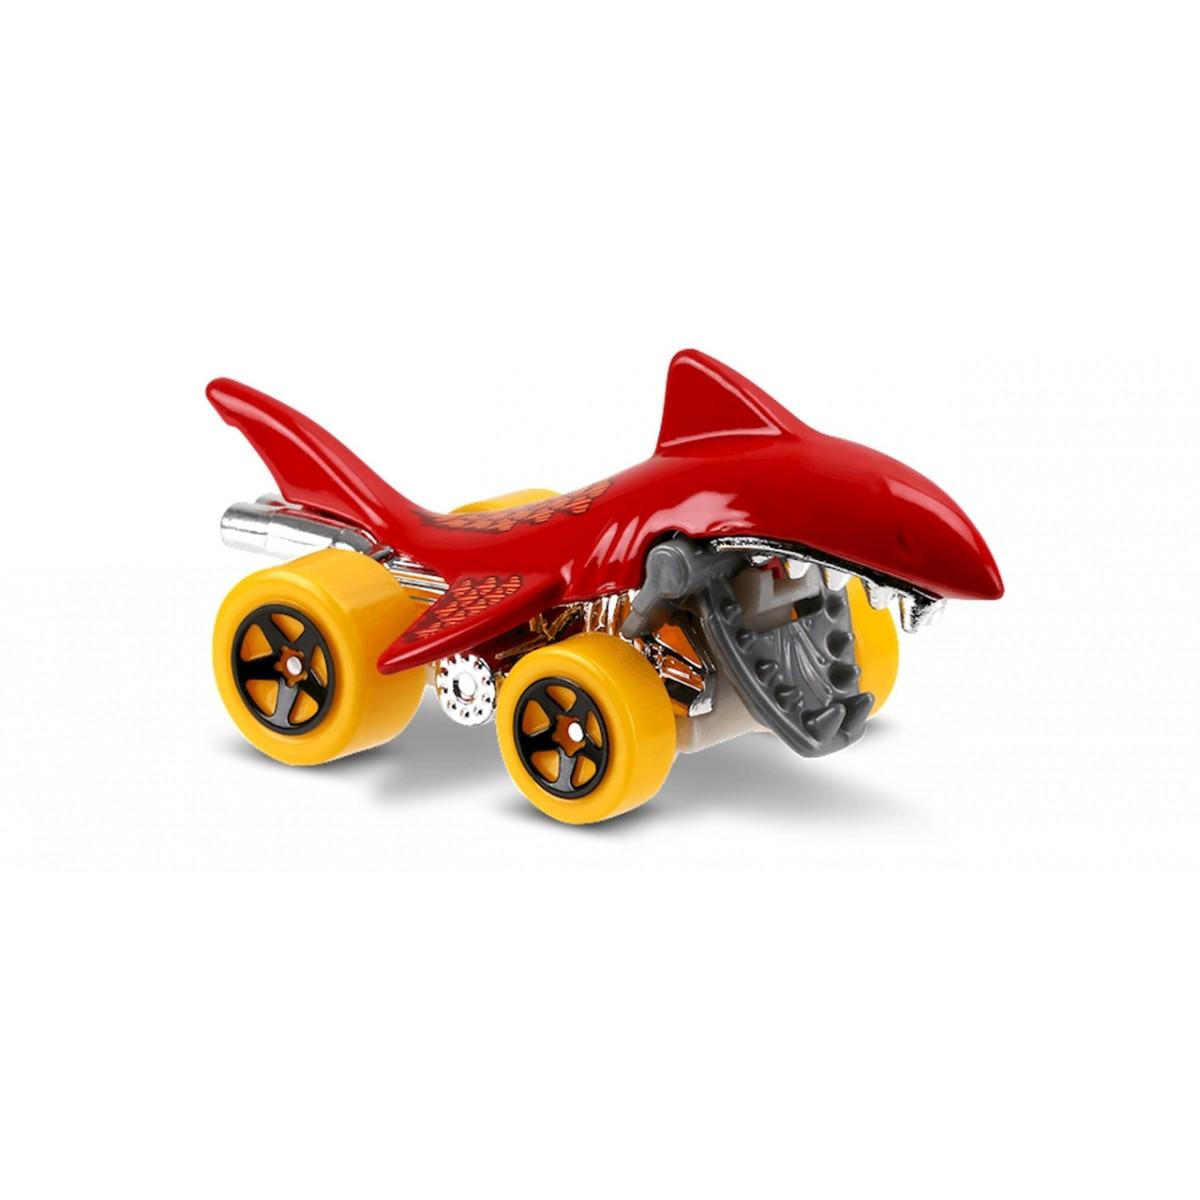 Carrinho Hot Wheels: Shark Bite Vermelho